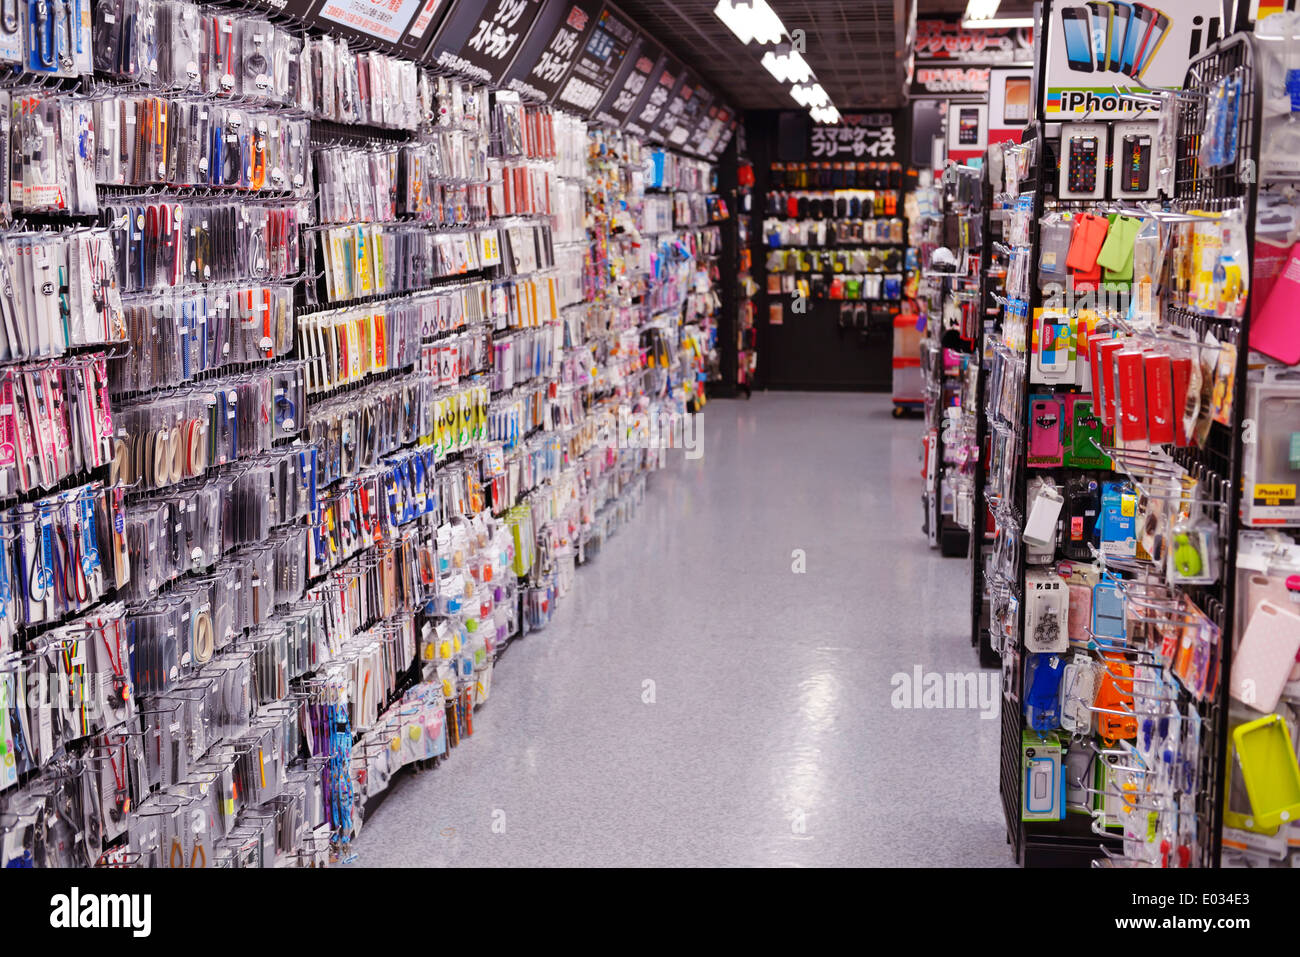 Handy-Zubehör bei großen Elektronik lagern Yodobashi Kamera, Yodobashi Akiba in Akihabara, Tokyo, Japan. Stockbild